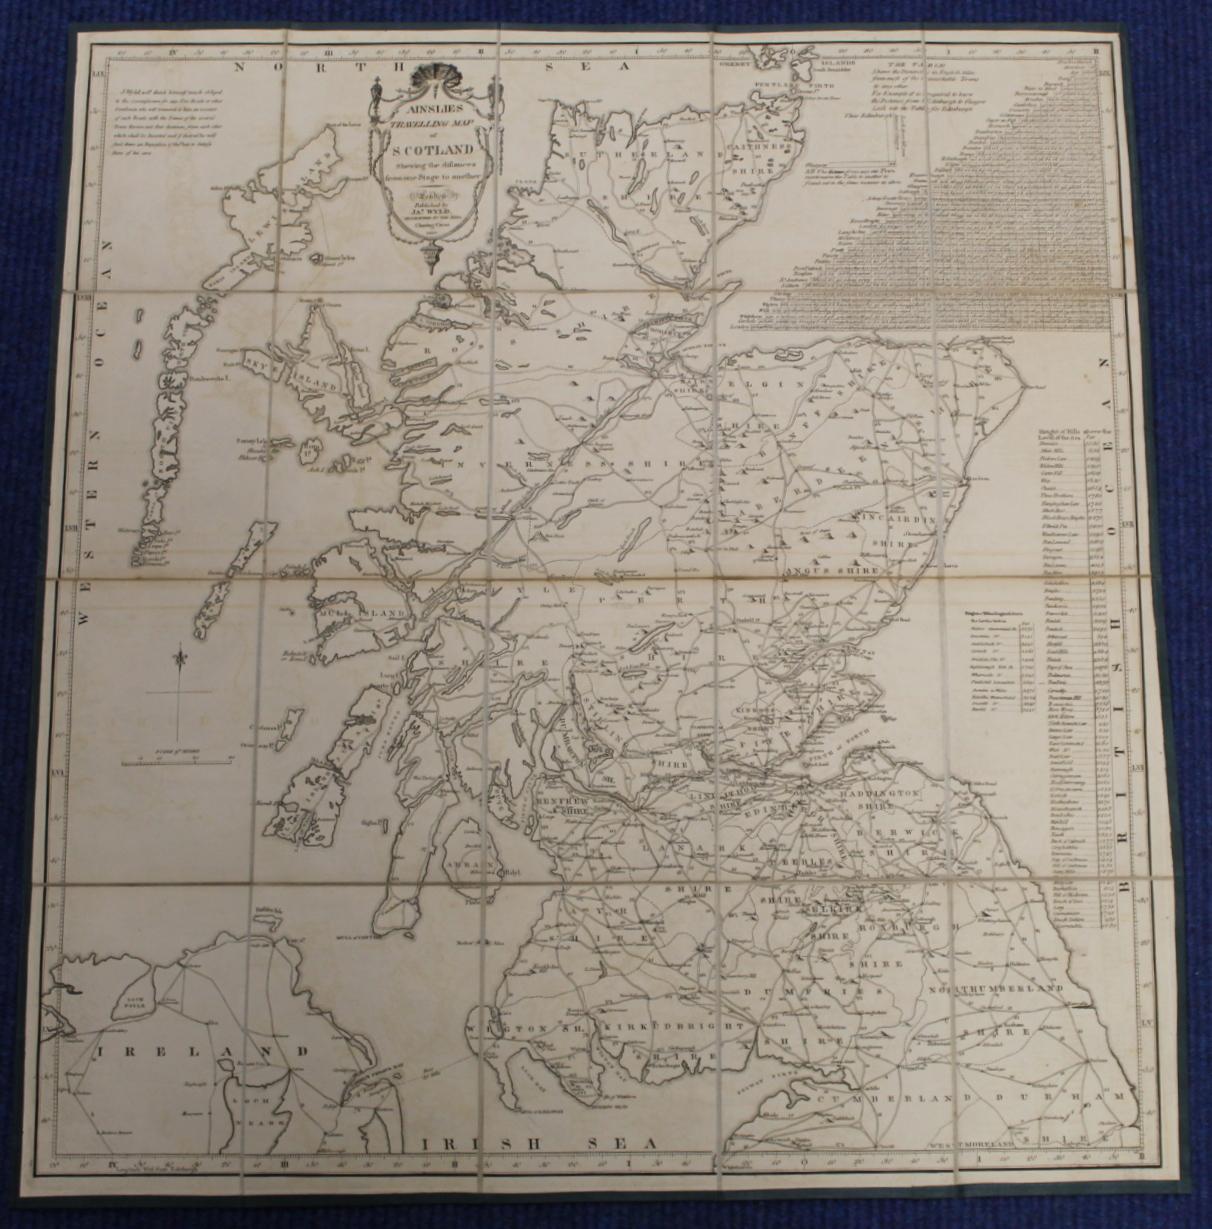 KIRKWOOD J. & SONS.Map of Scotland. Hand col. eng. fldg. linen map in well worn orig. slip case. - Image 27 of 36